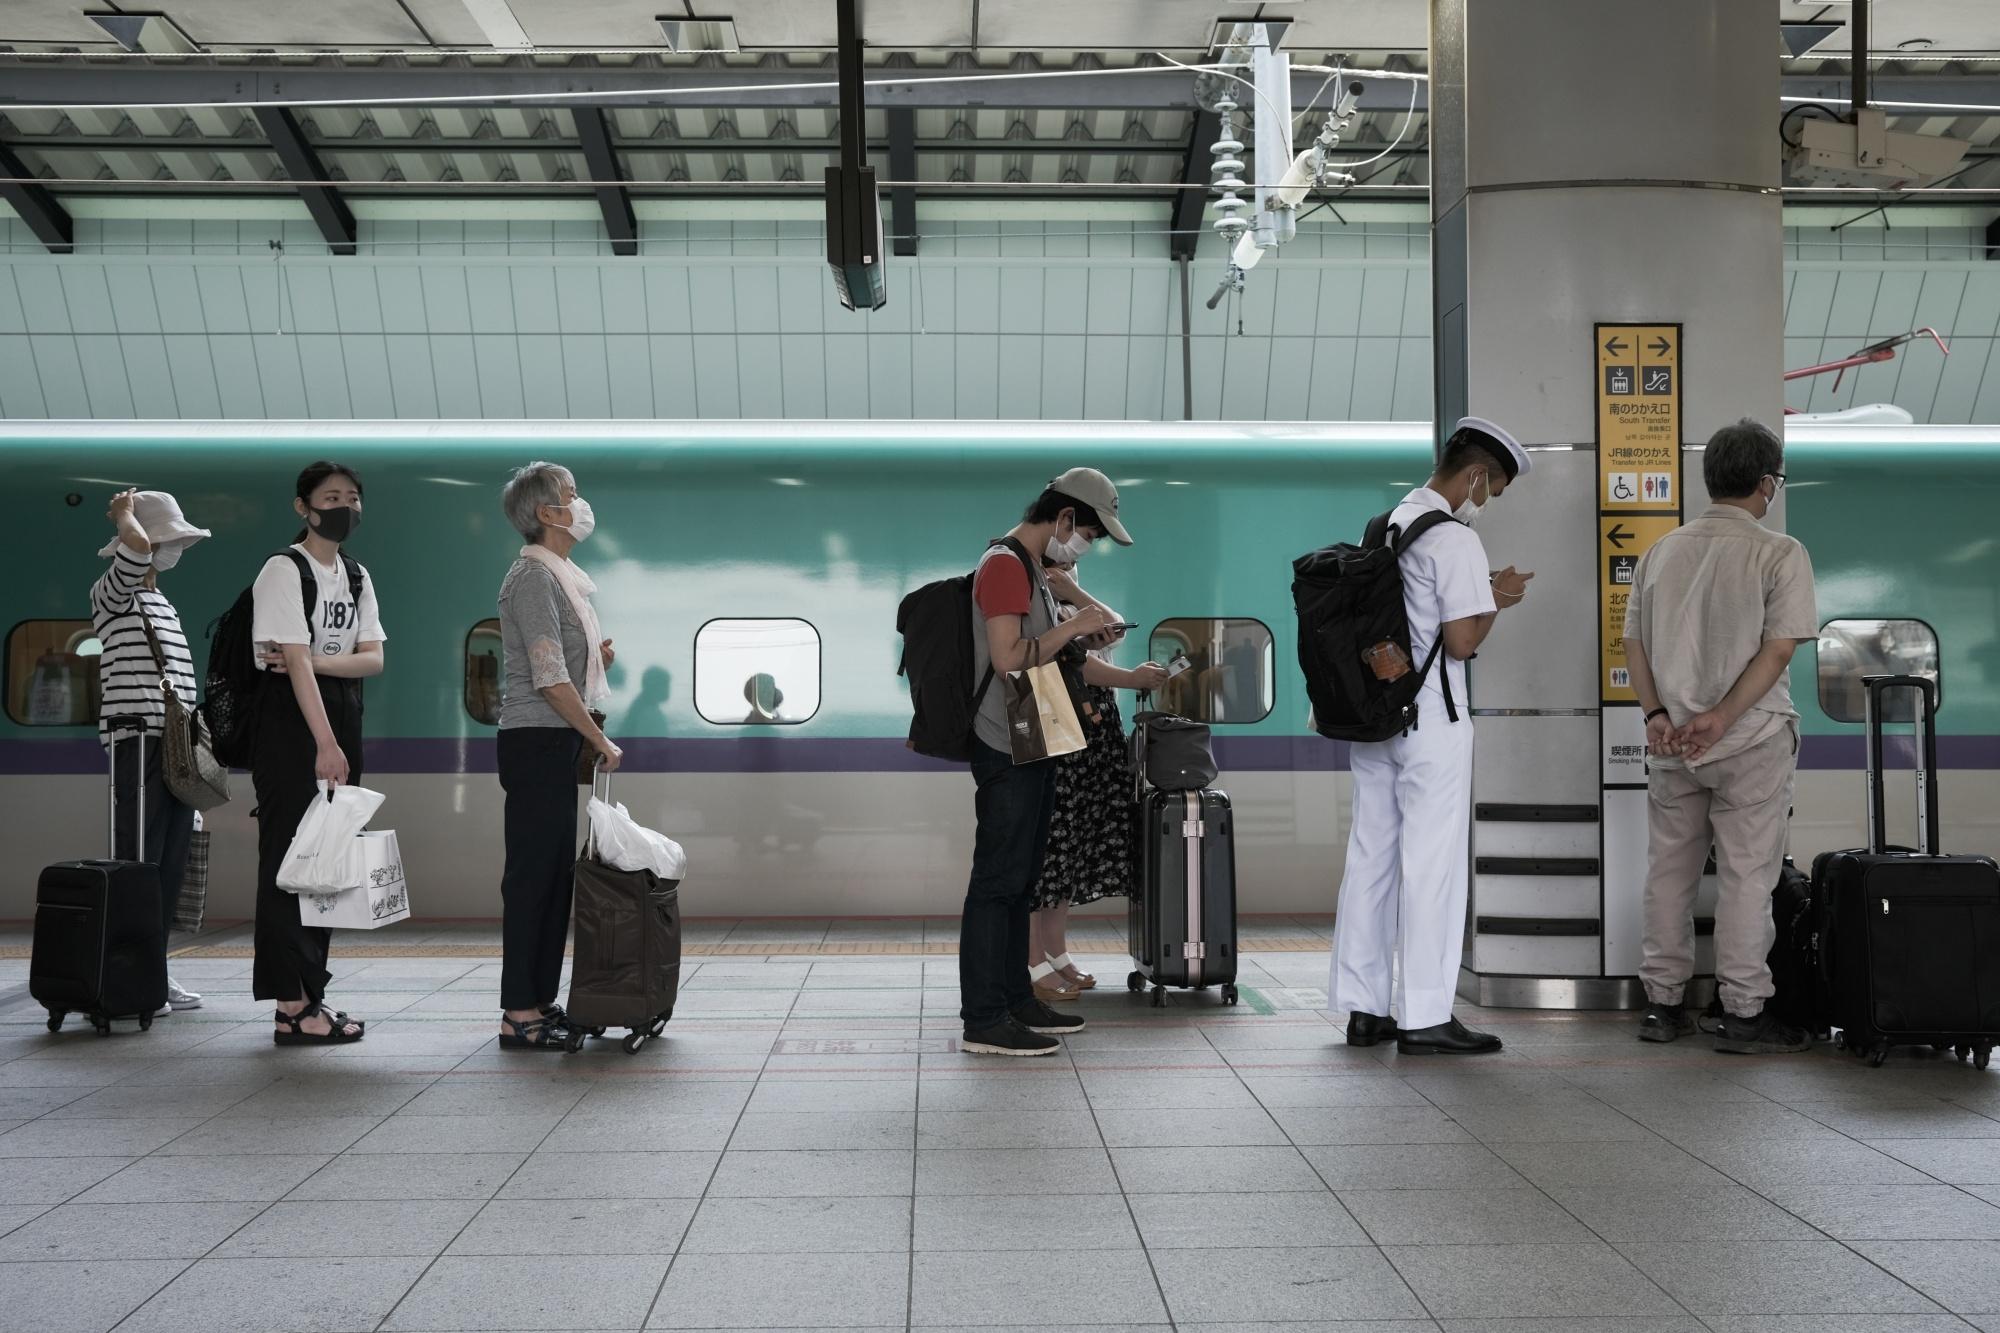 Travelers at Tokyo Station Ahead of Obon-holiday Week